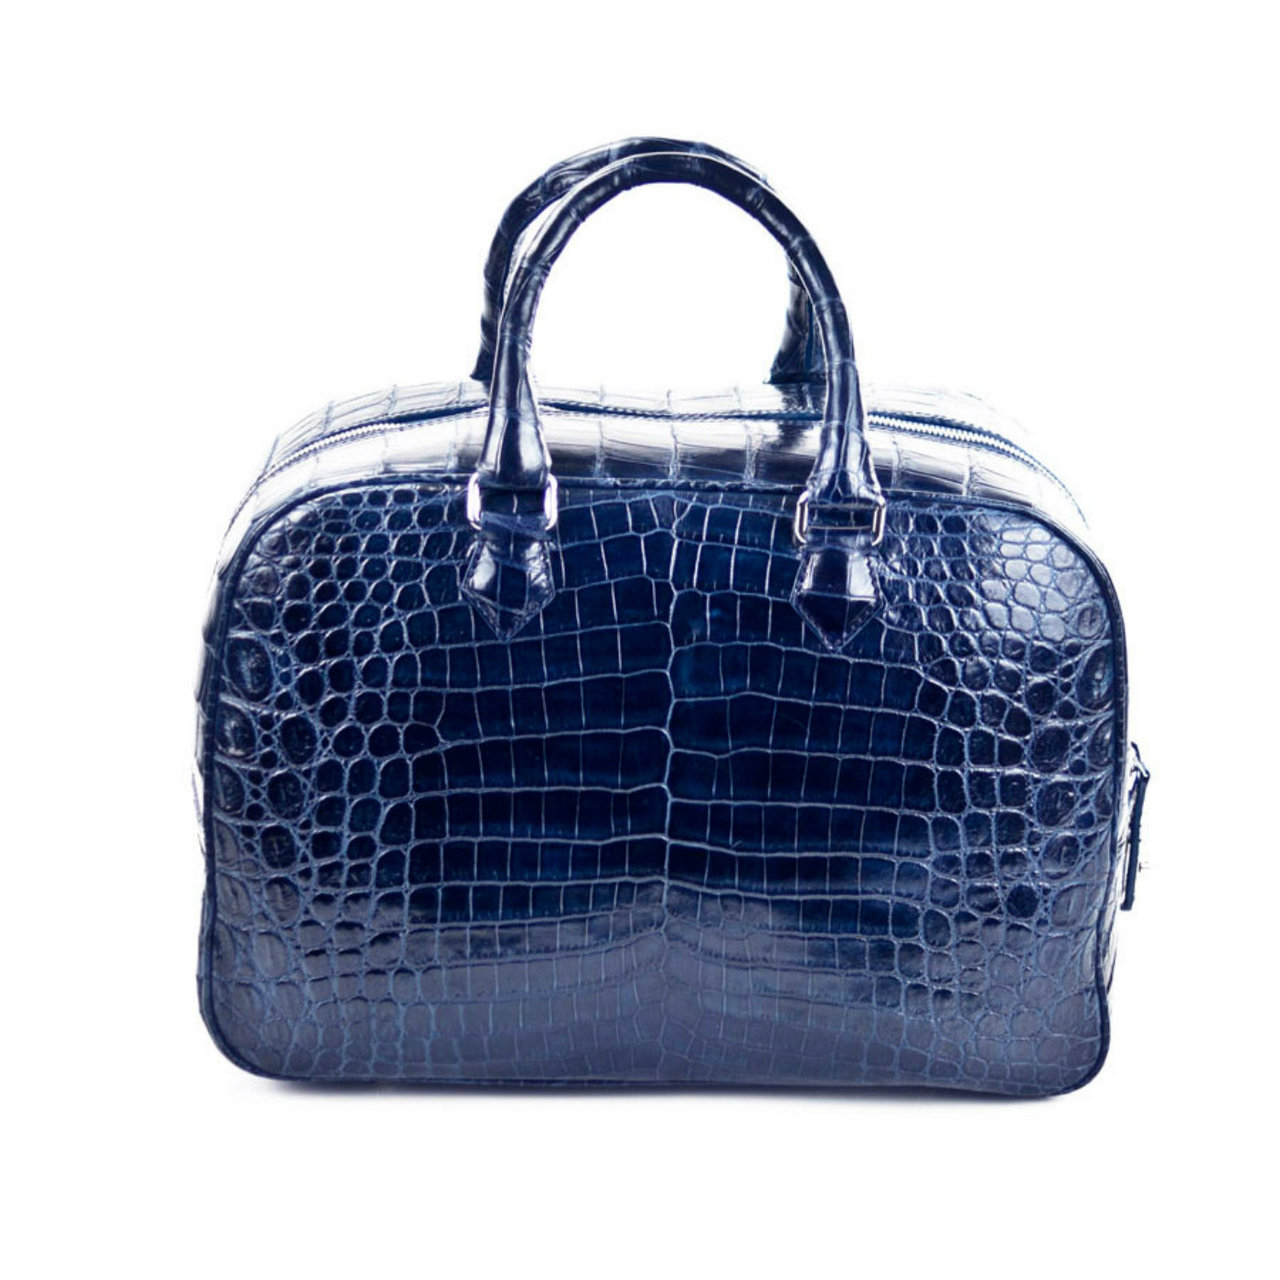 Bridget - Nile Crocodile Belly Satchel Bag - Dark Blue